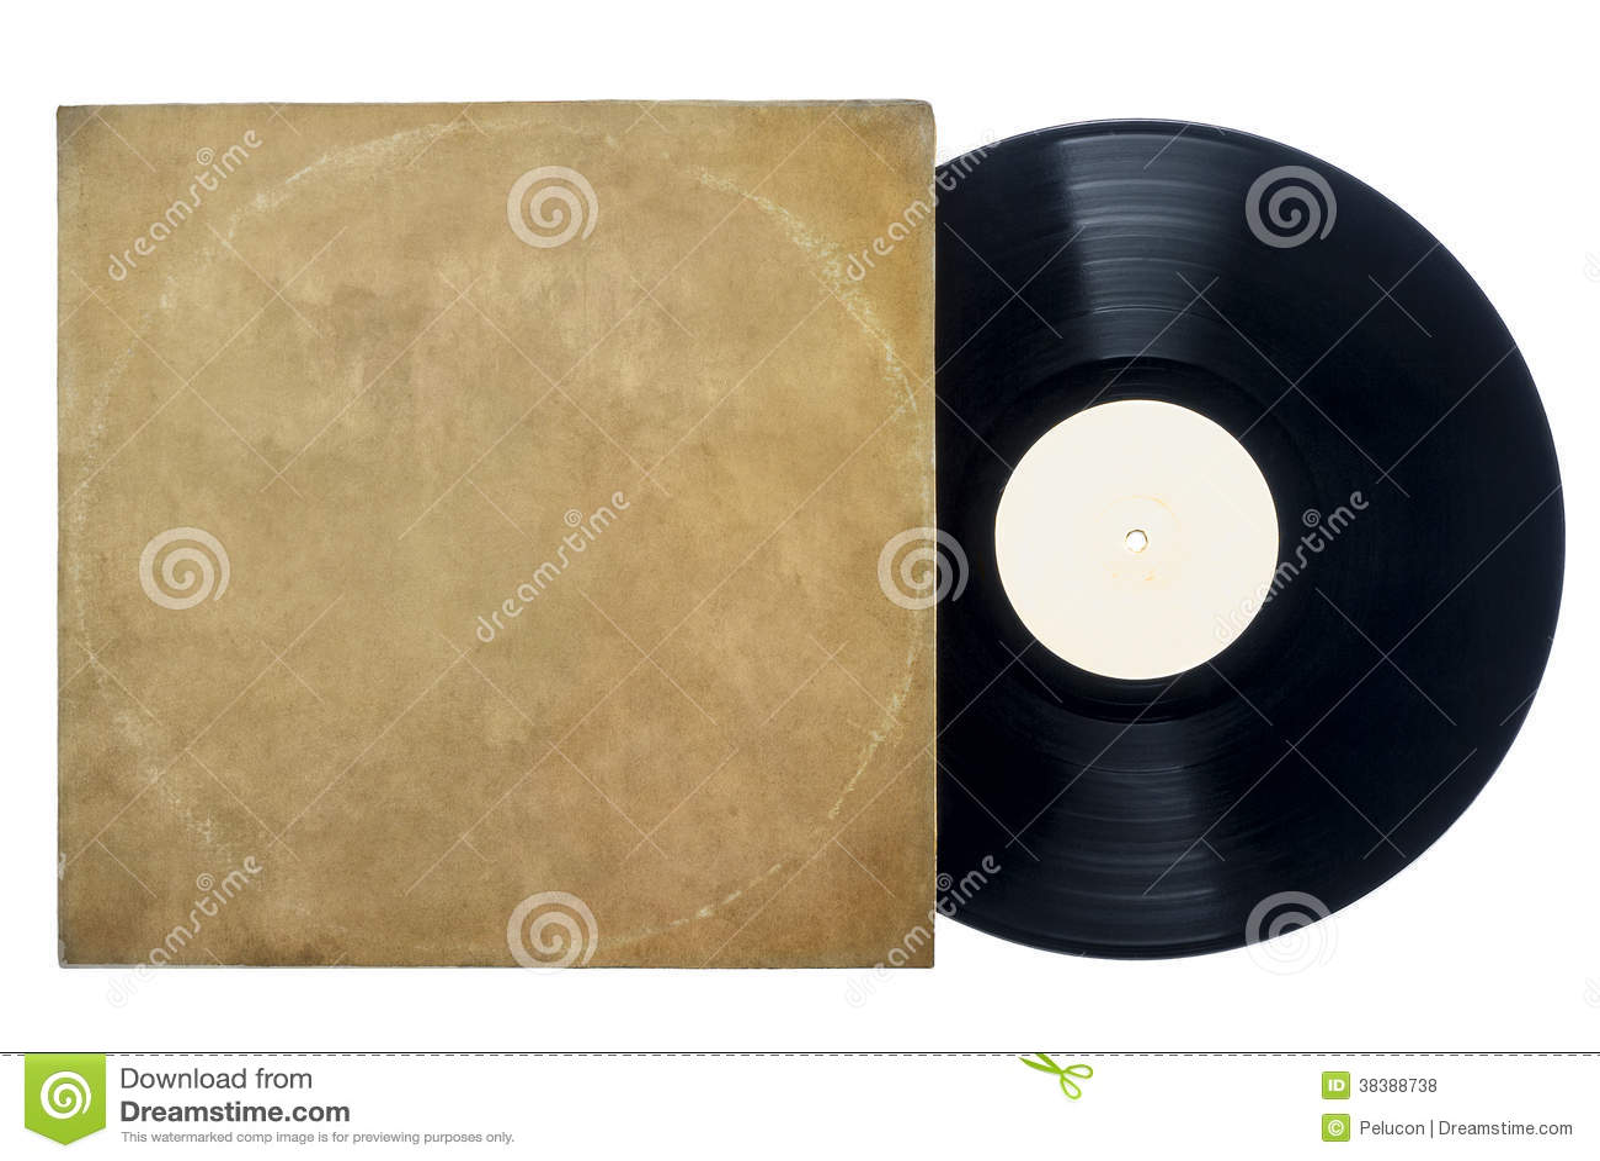 Retro Long Play Vinyl Record With Sleeve Royalty Free